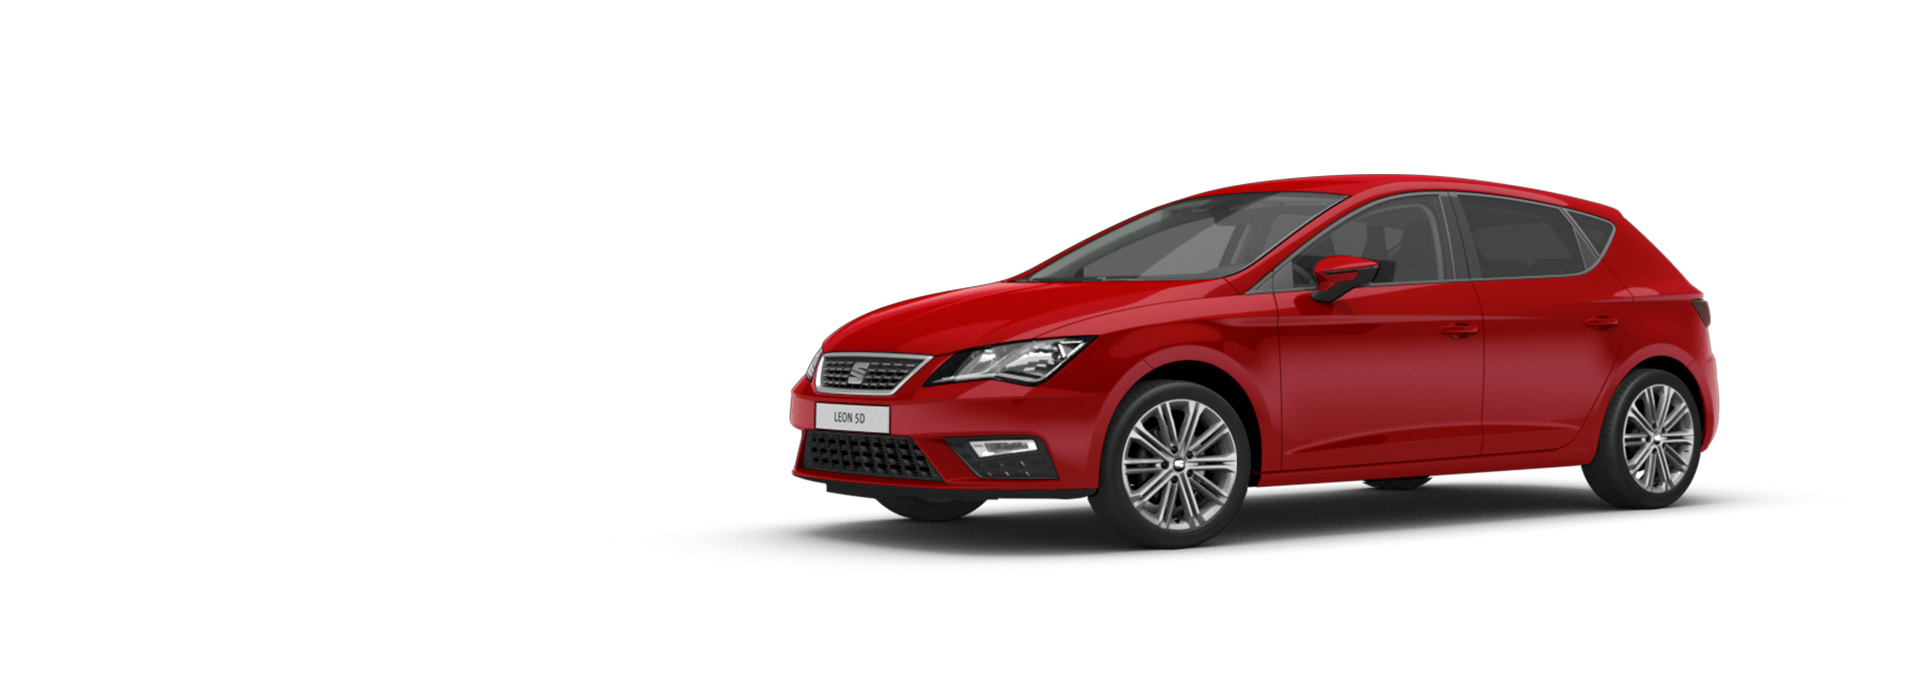 SEAT Leon Xcellence 1.4 TSI